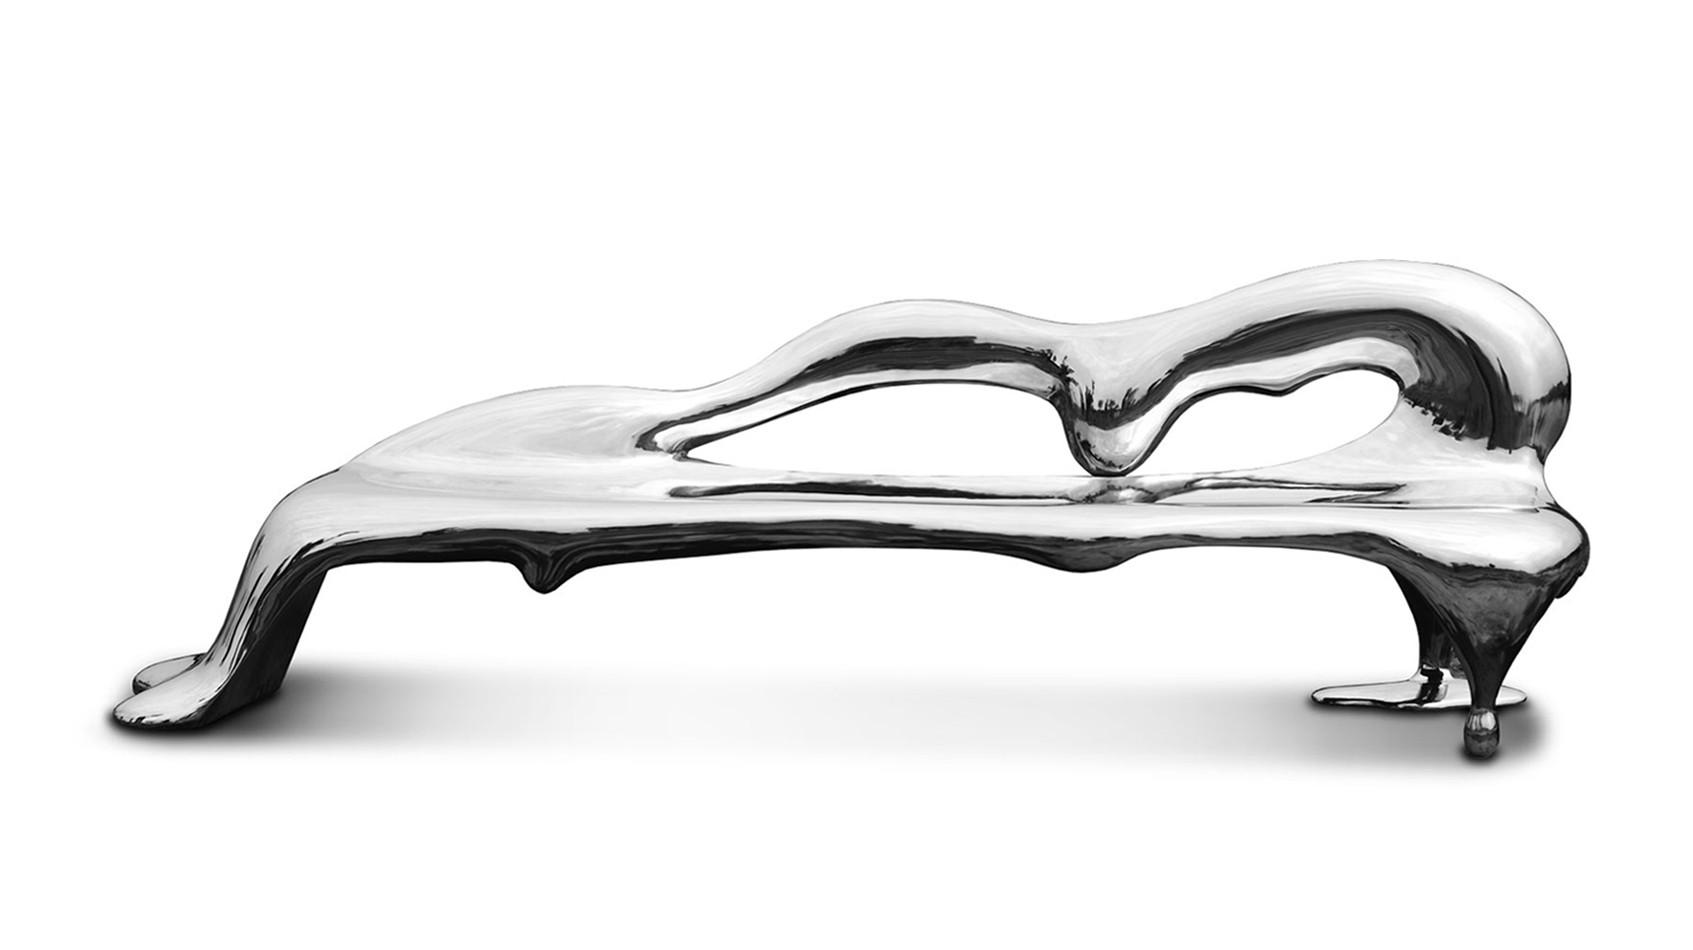 "Edelstahl Sofa Bank Sitzbank ""Flow"" auf Hochglanz poliert. Länge 268 cm. Handarbeit Unikat."